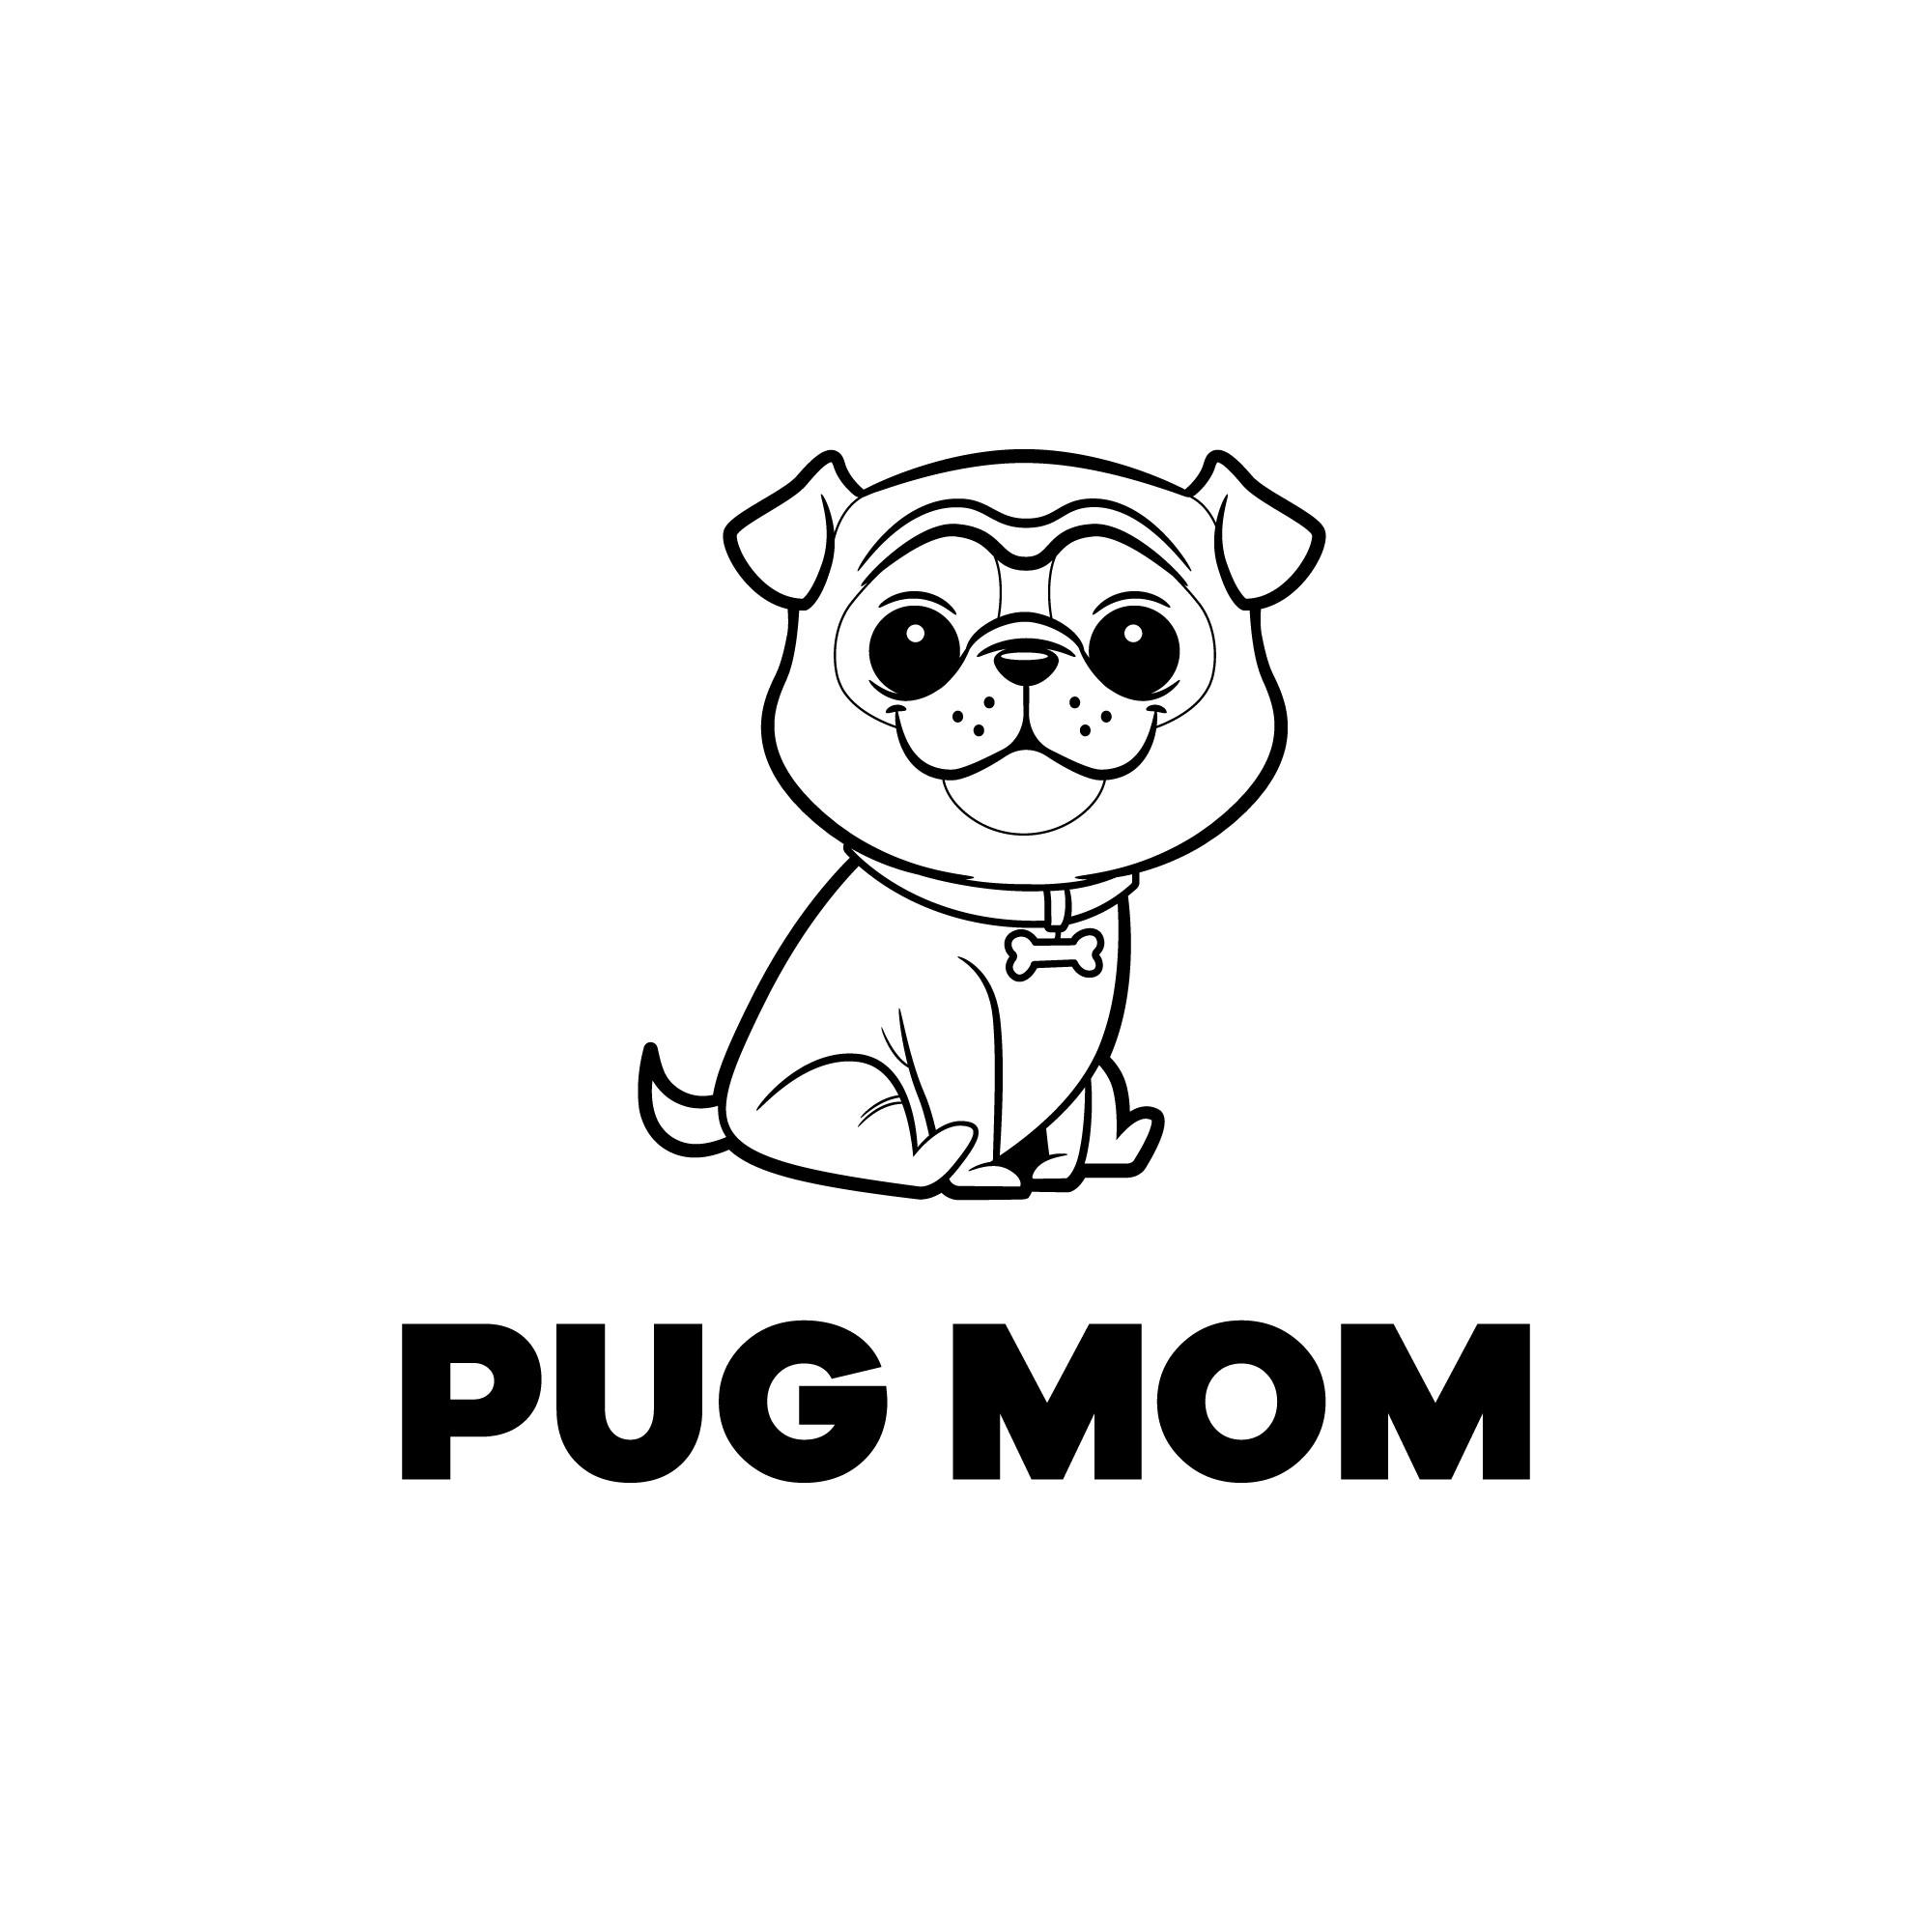 Rally Pug Moms around YOUR design!